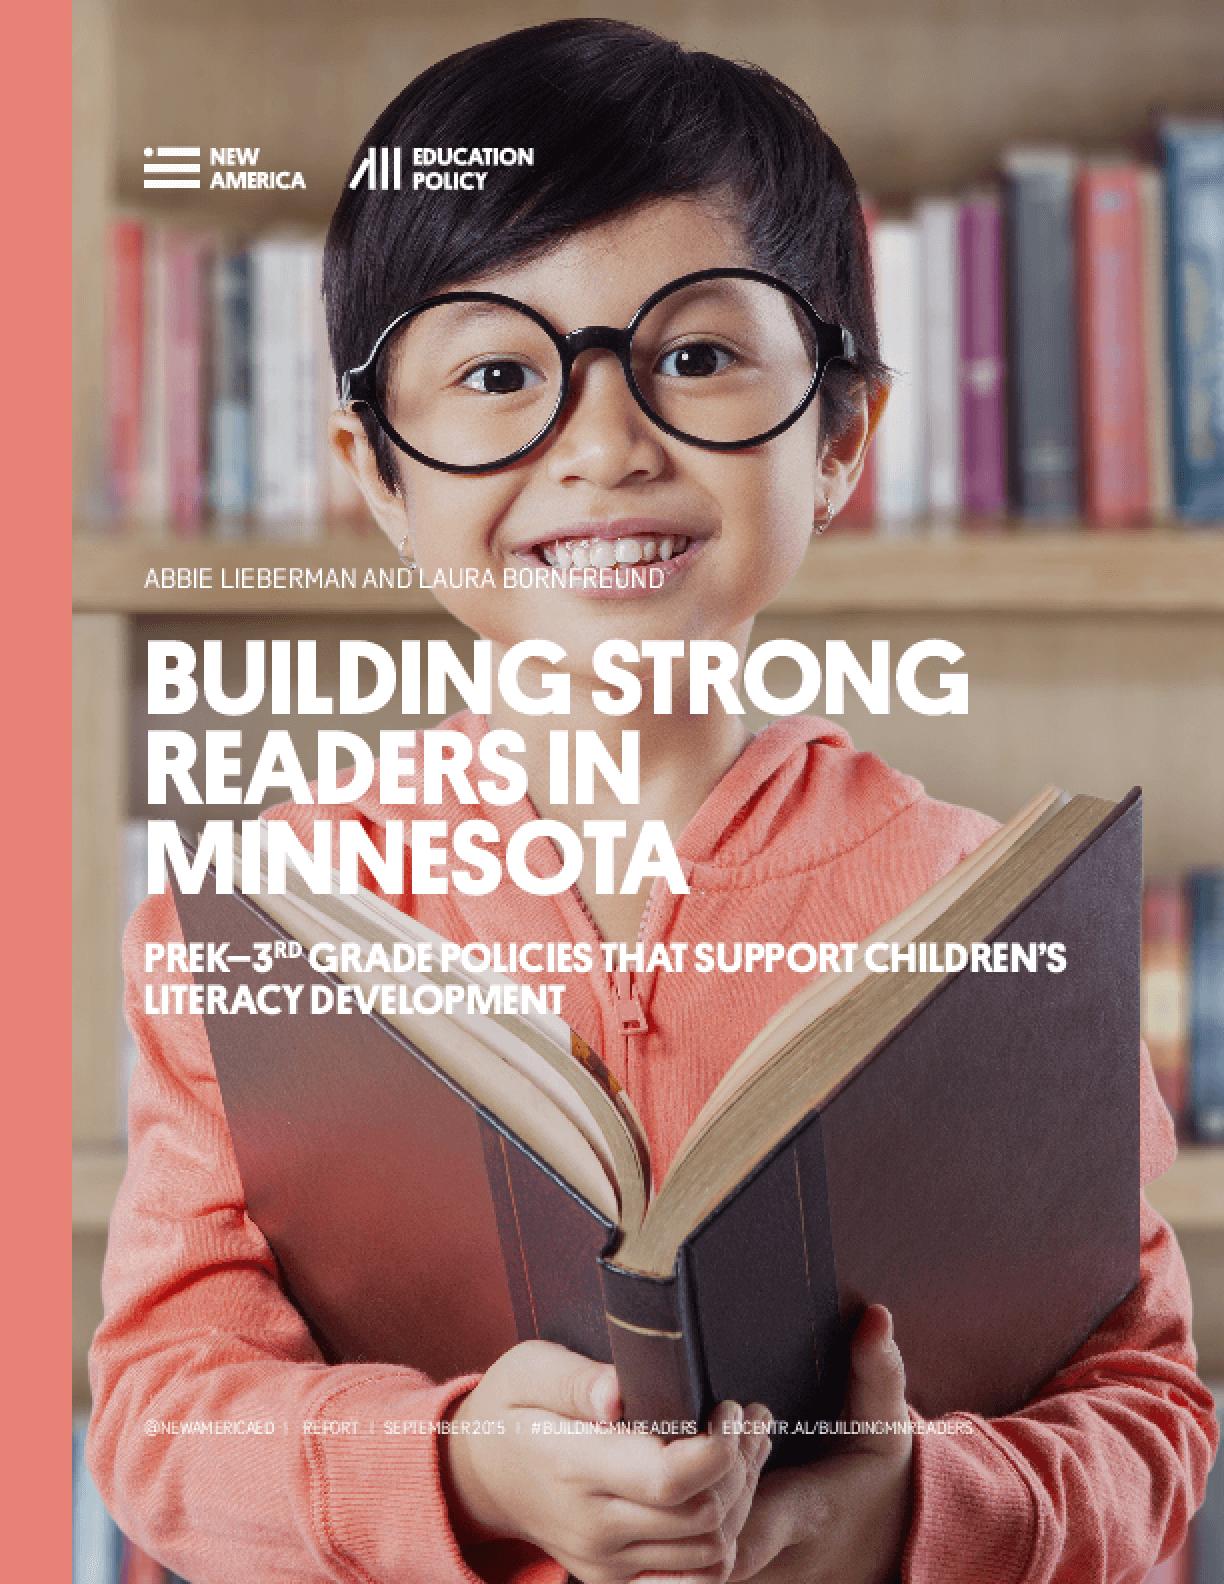 Building Strong Readers In Minnesota: PreK-3rd Grade Policies That Support Children's Literacy Development